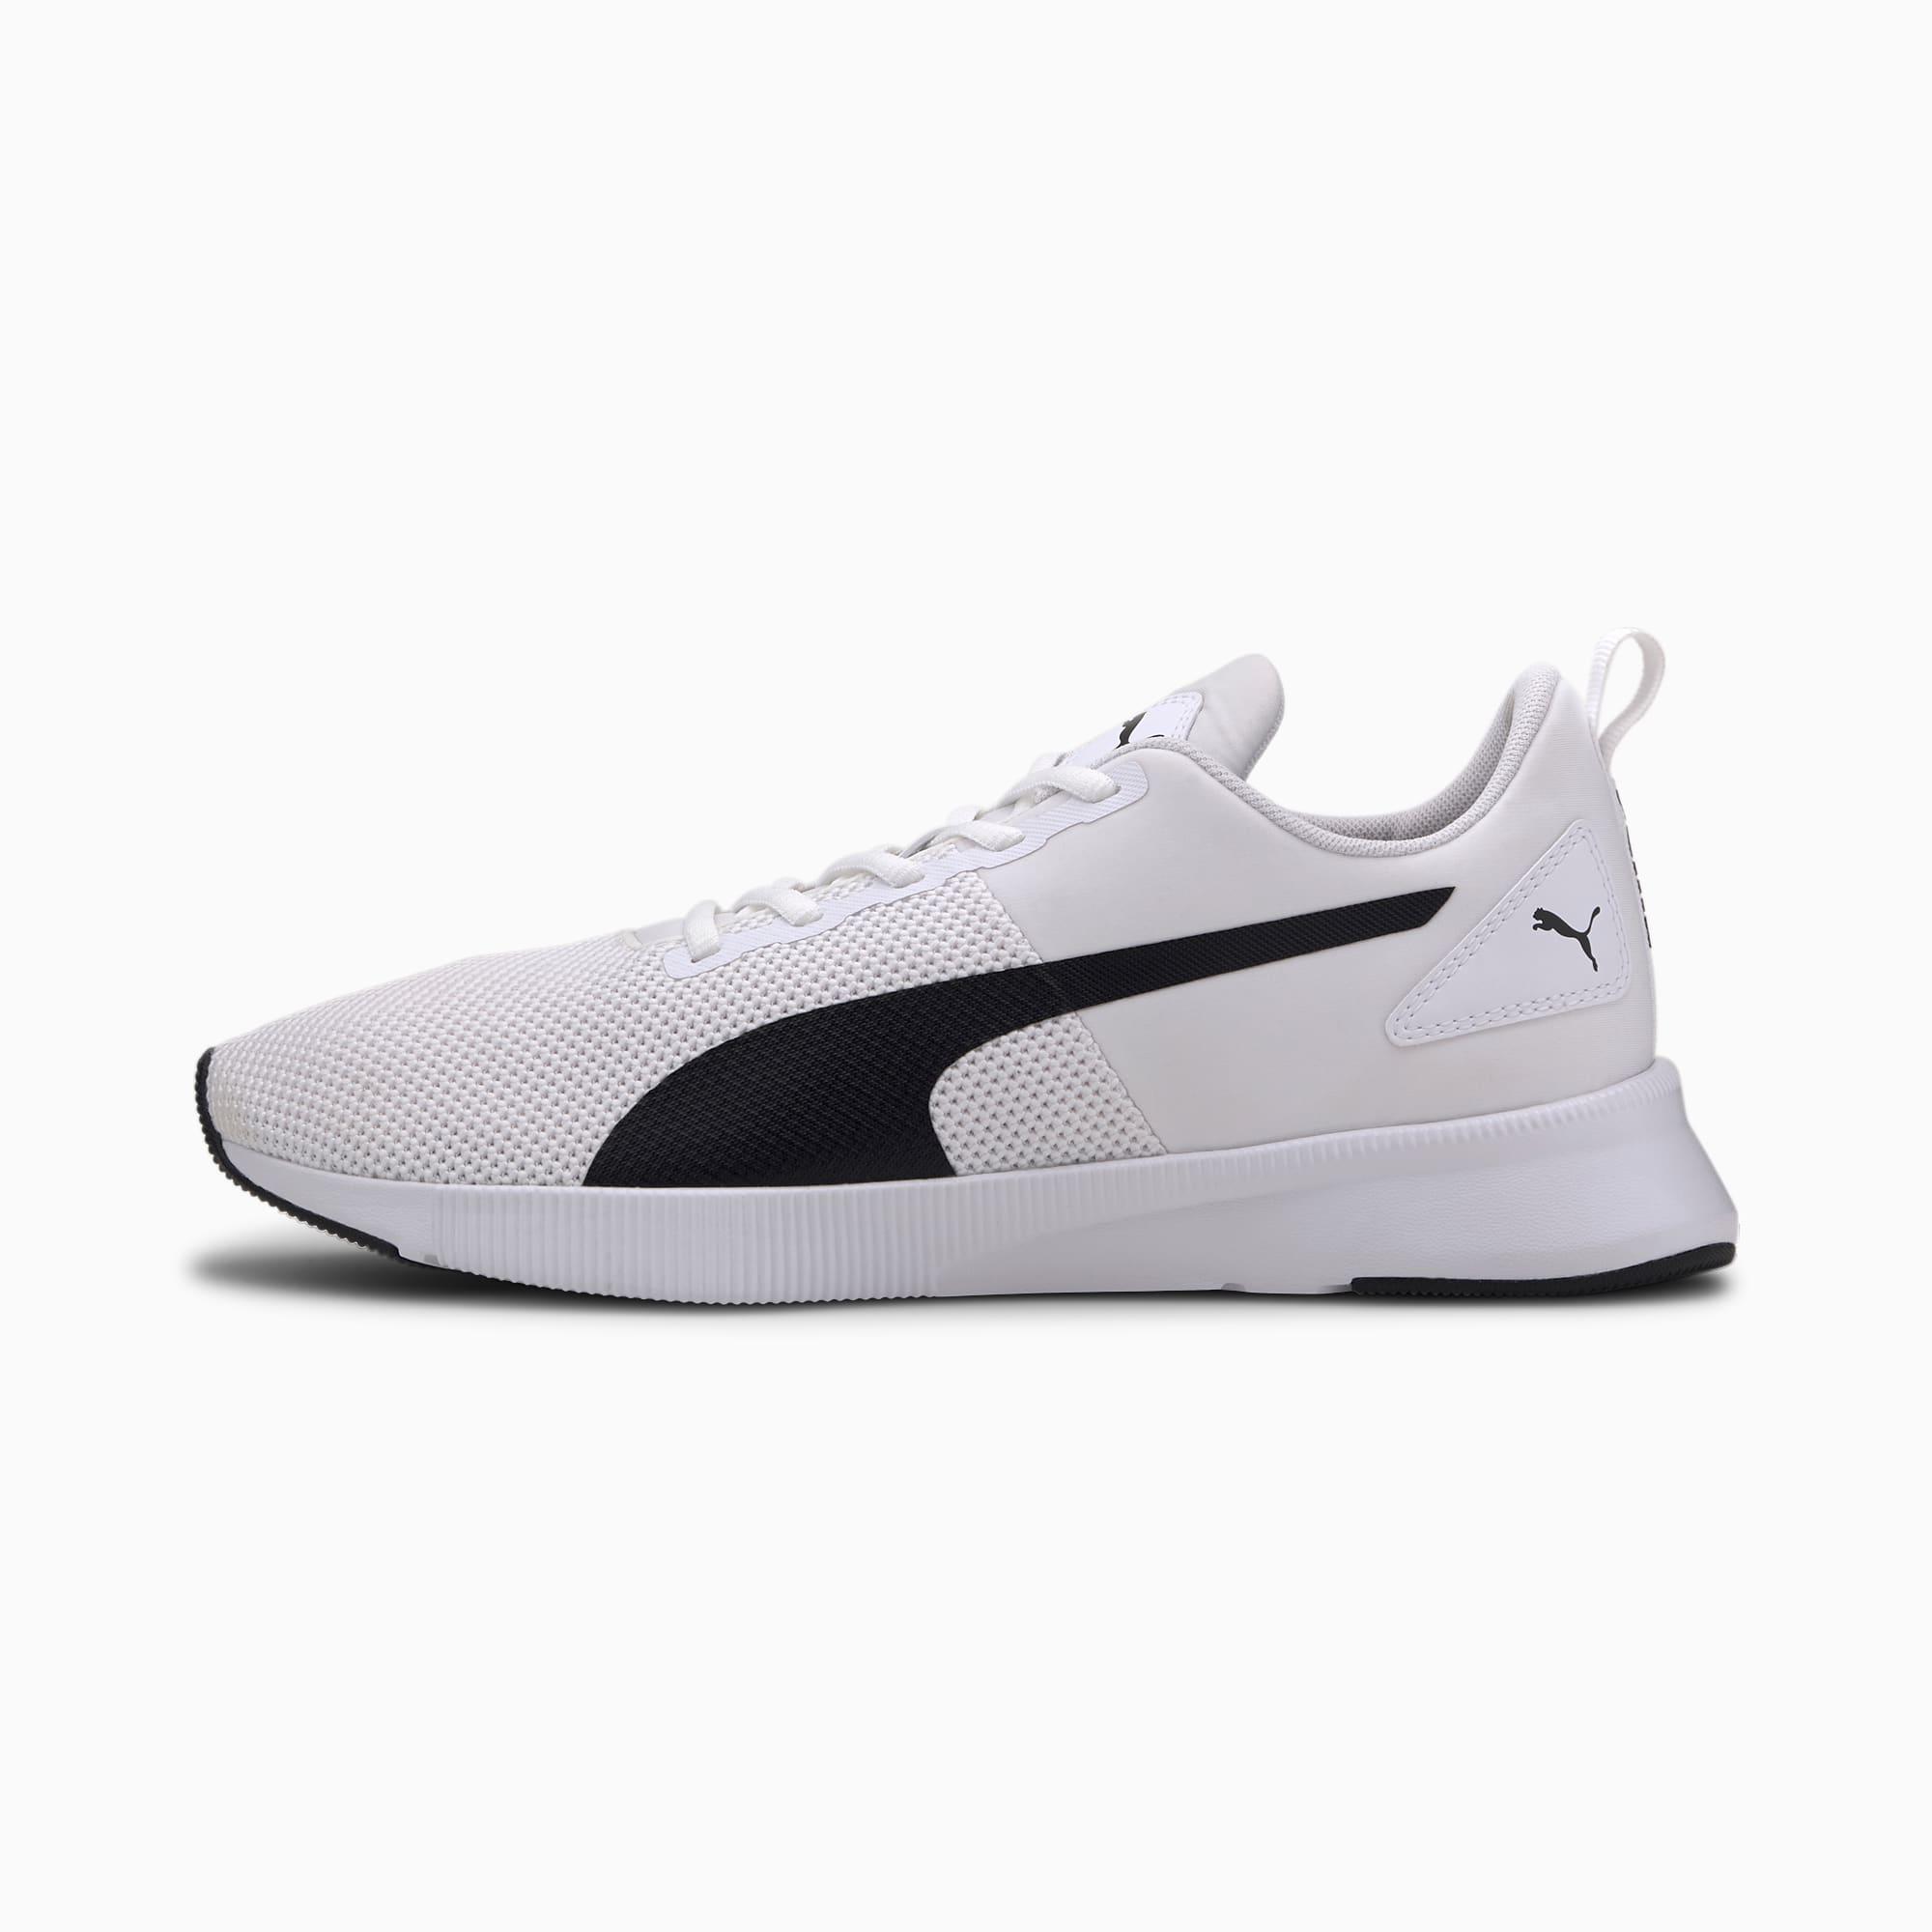 PUMA Chaussure de course Flyer Runner, Blanc/Noir, Taille 46, Chaussures